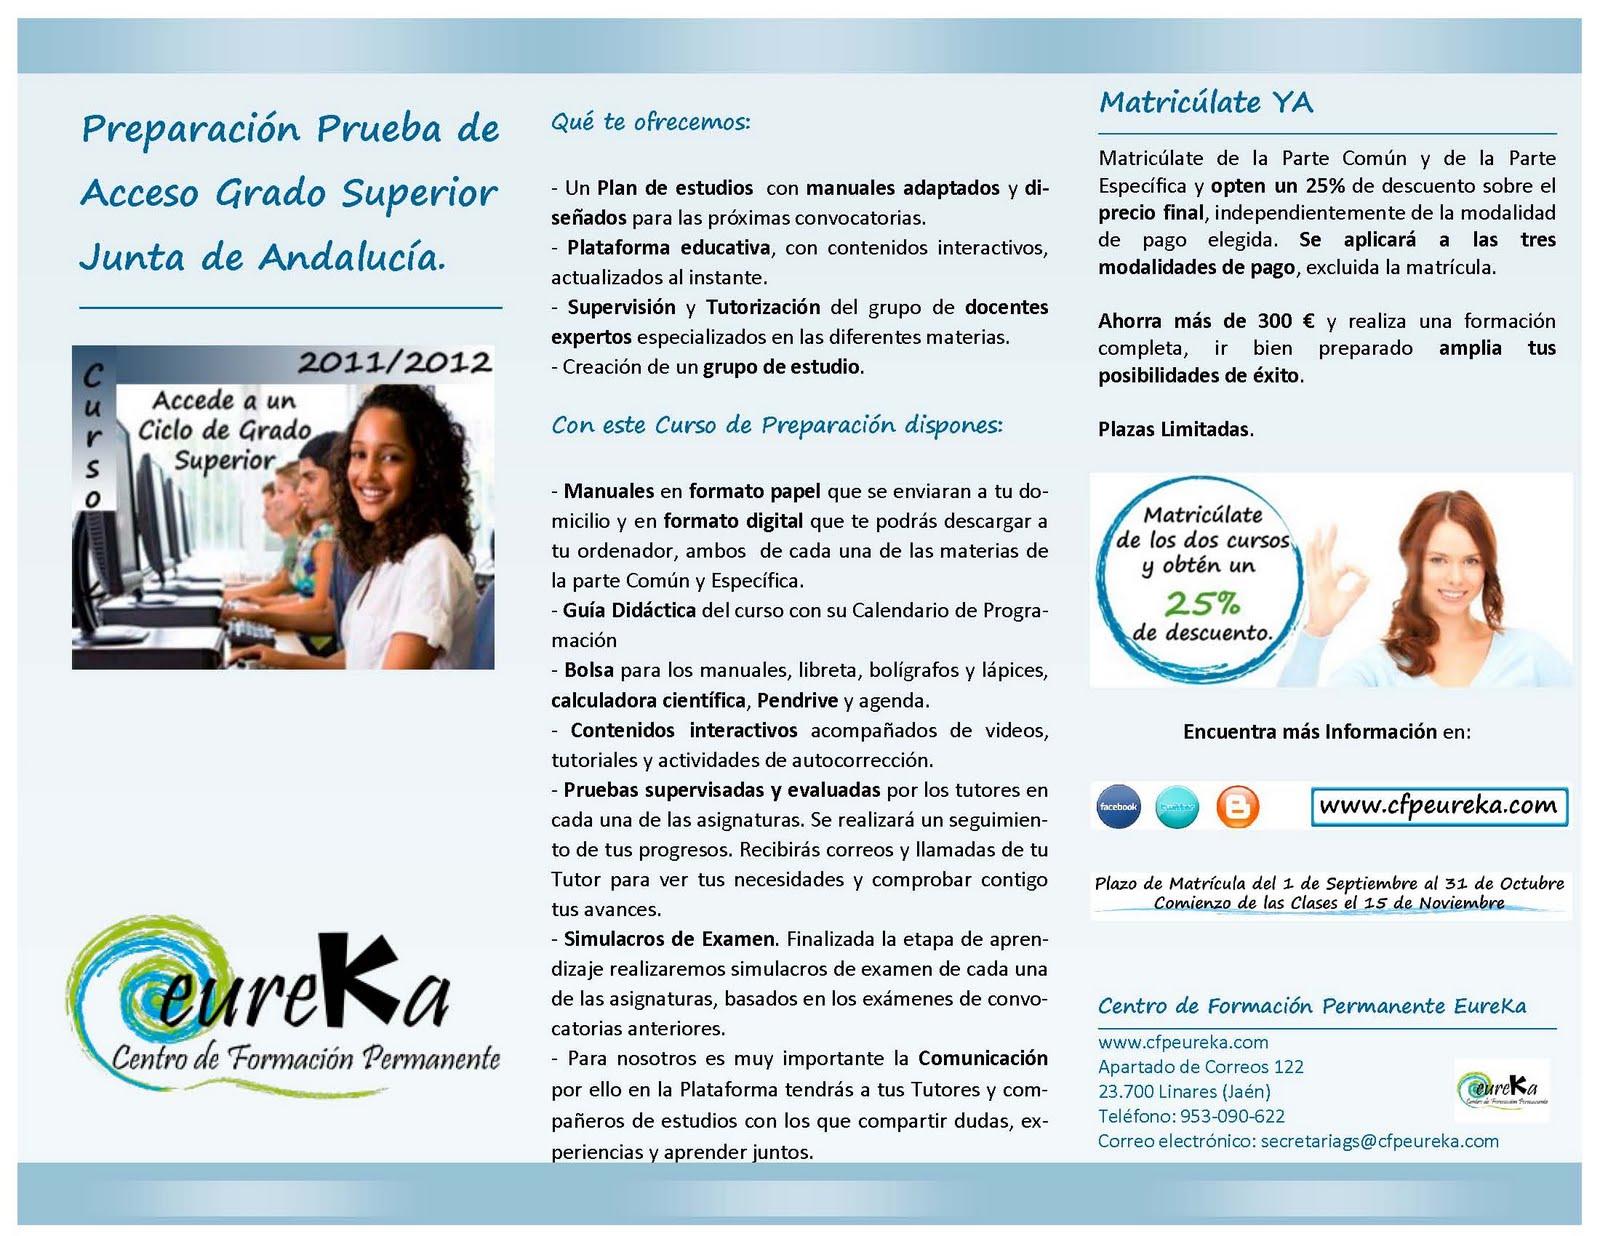 junta de andalucia curso: